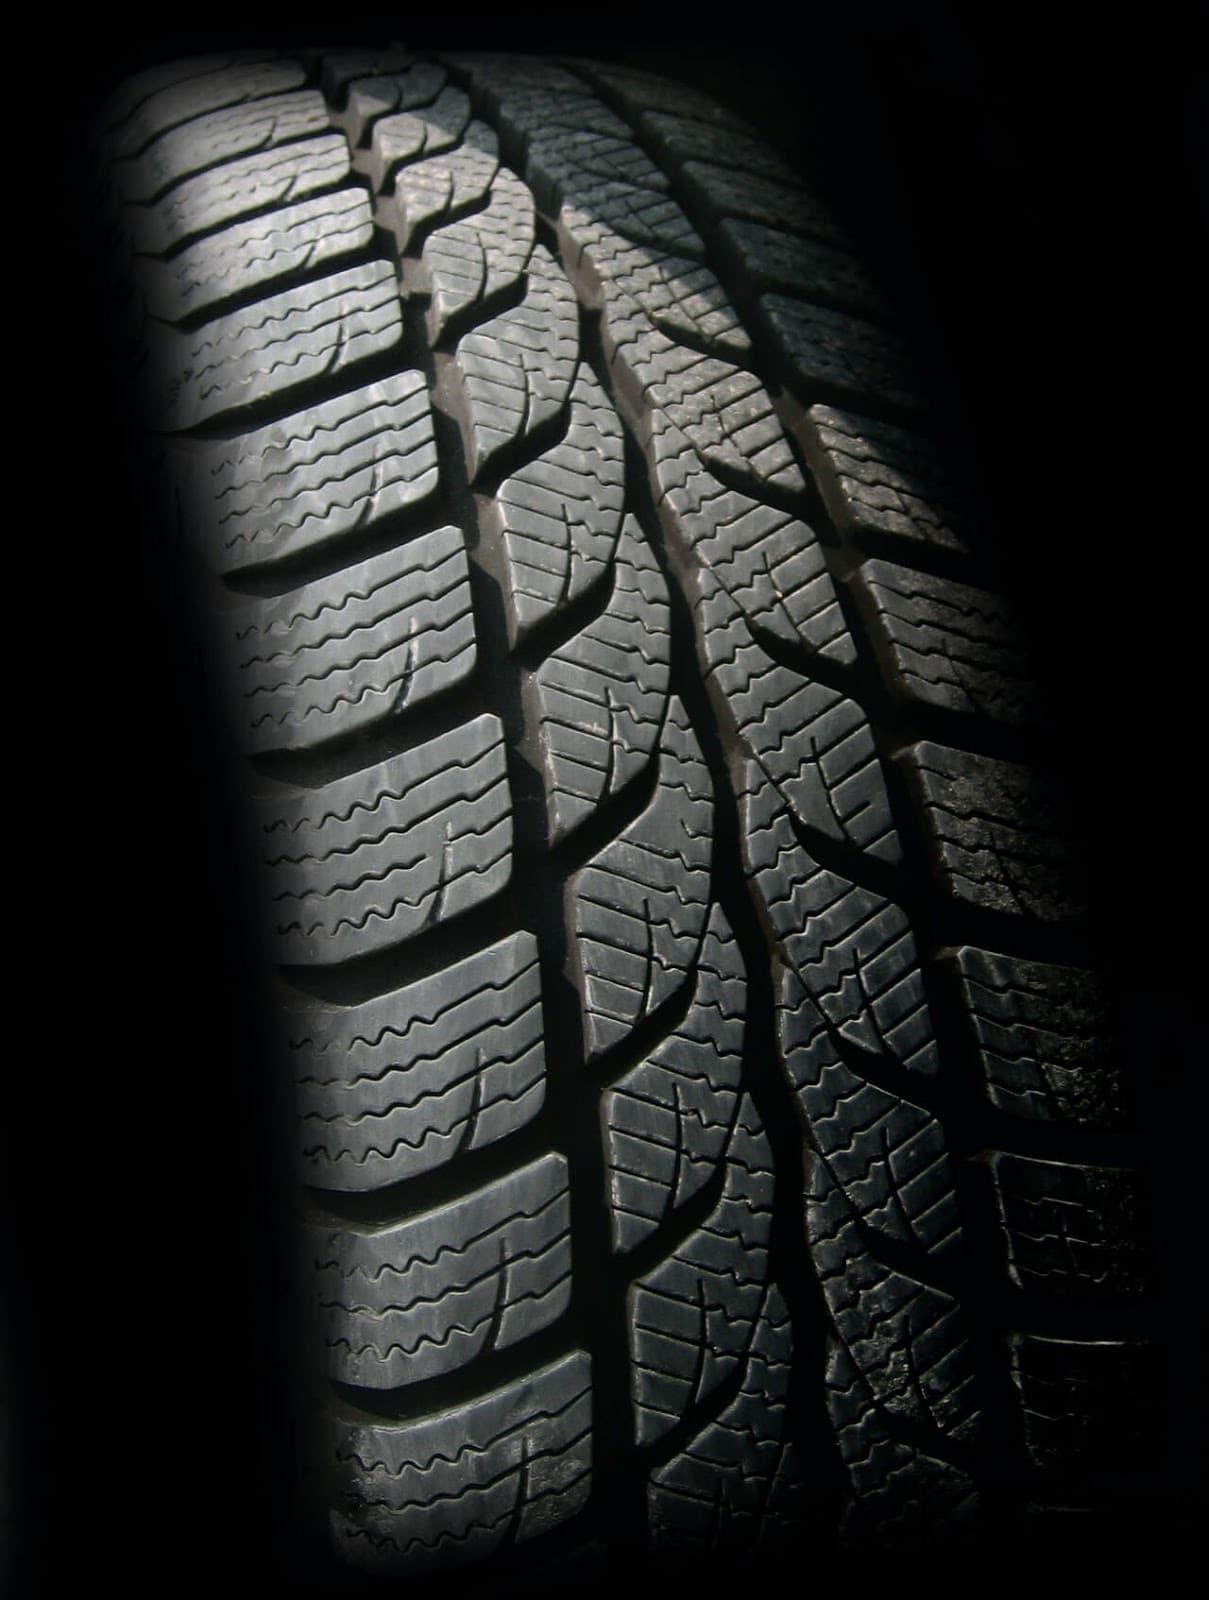 Tire closeup 1